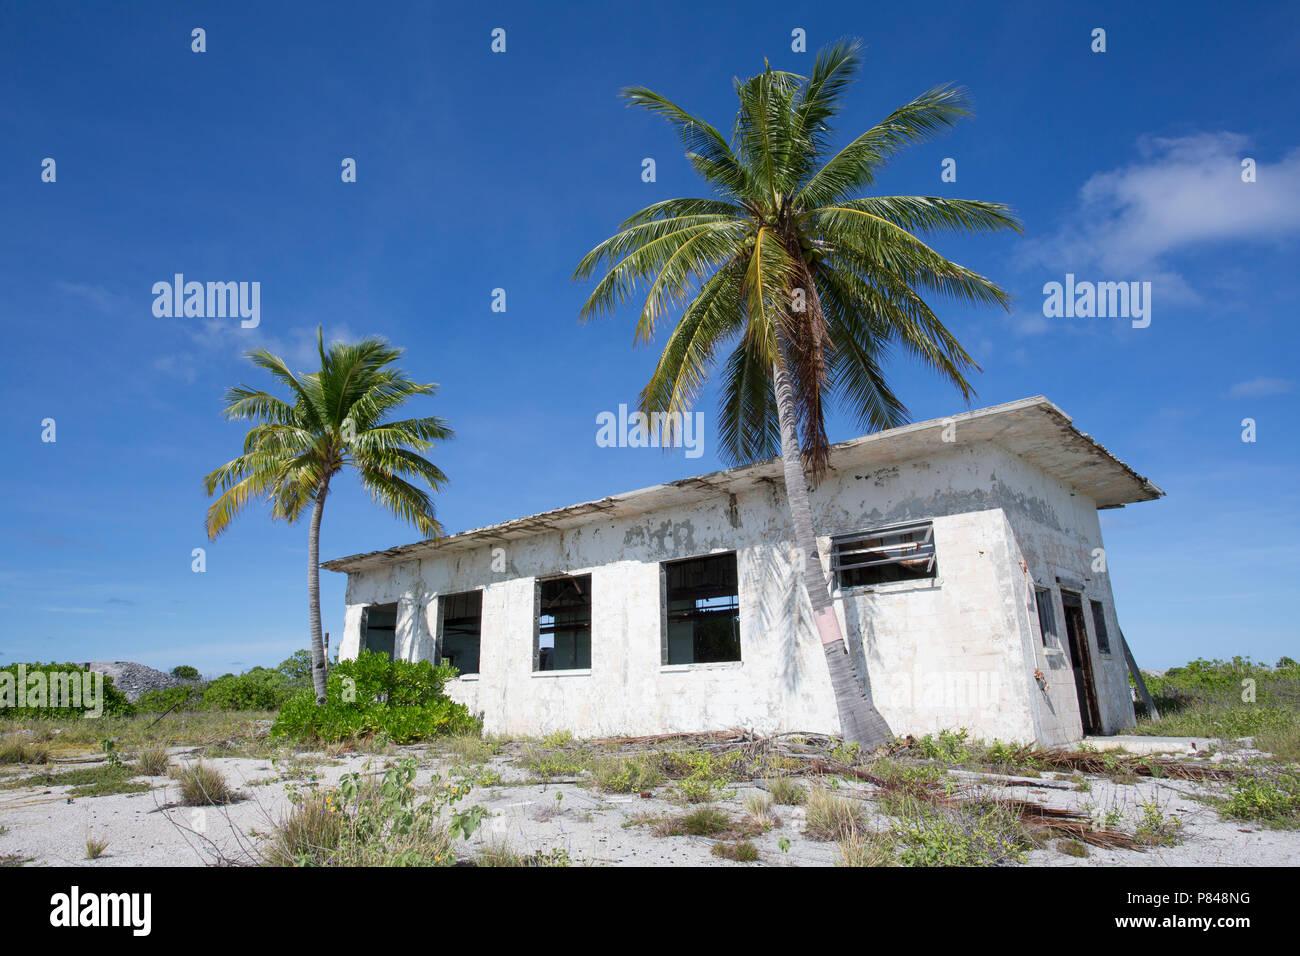 WWII ruins on Kanton Island, Kiribati - Stock Image